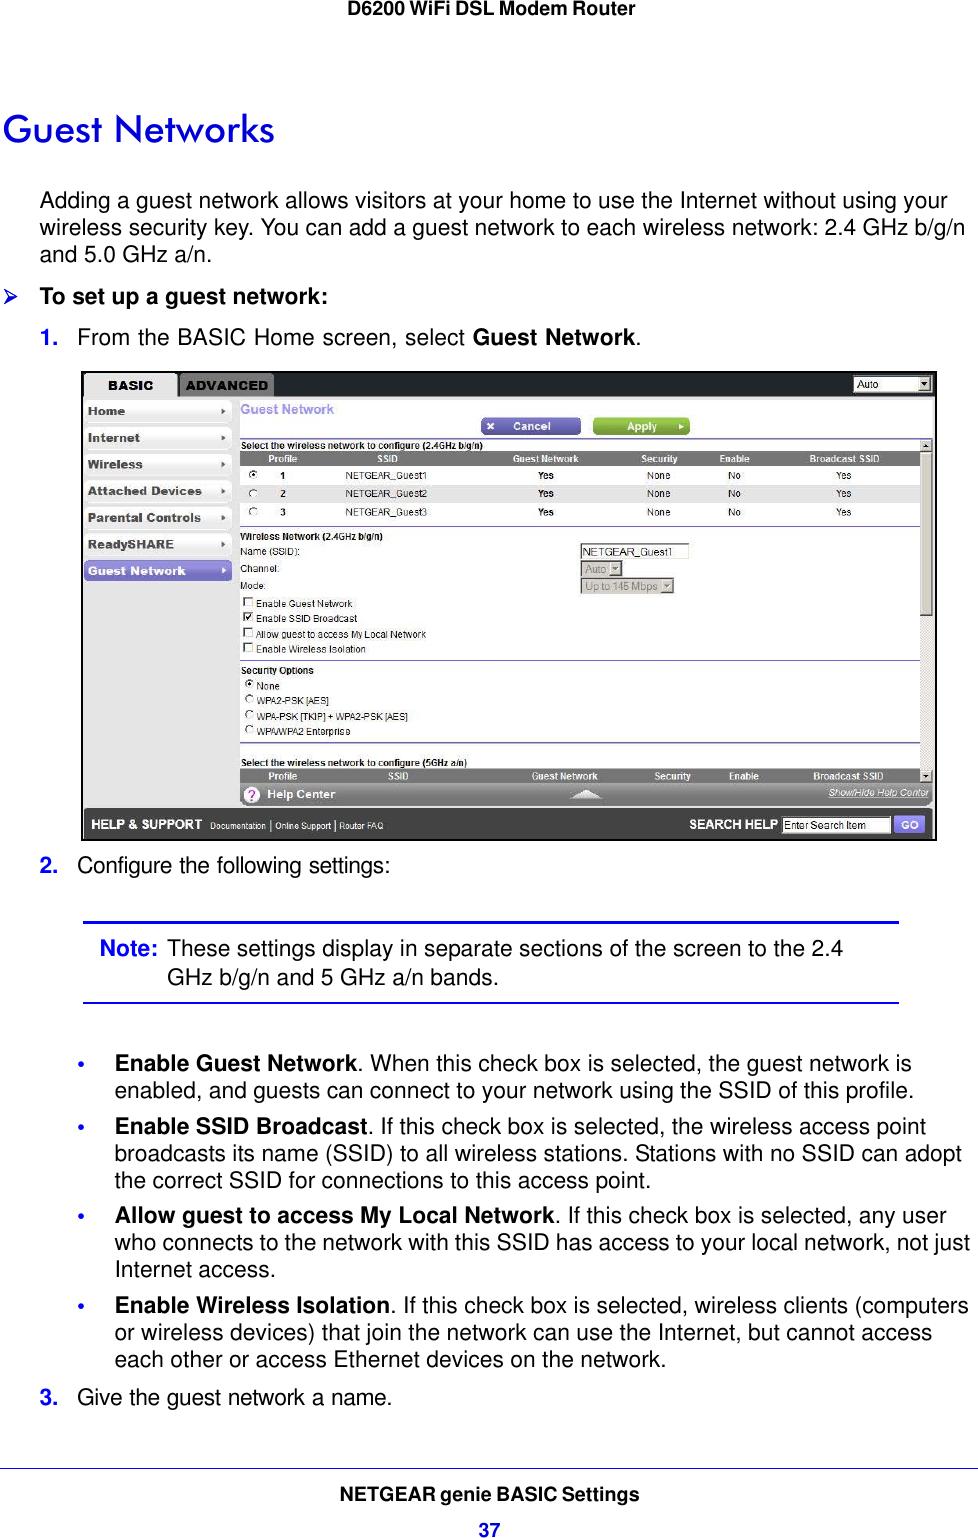 Netgear D6200 Wireless Modem Router 100Nas Users Manual WiFi